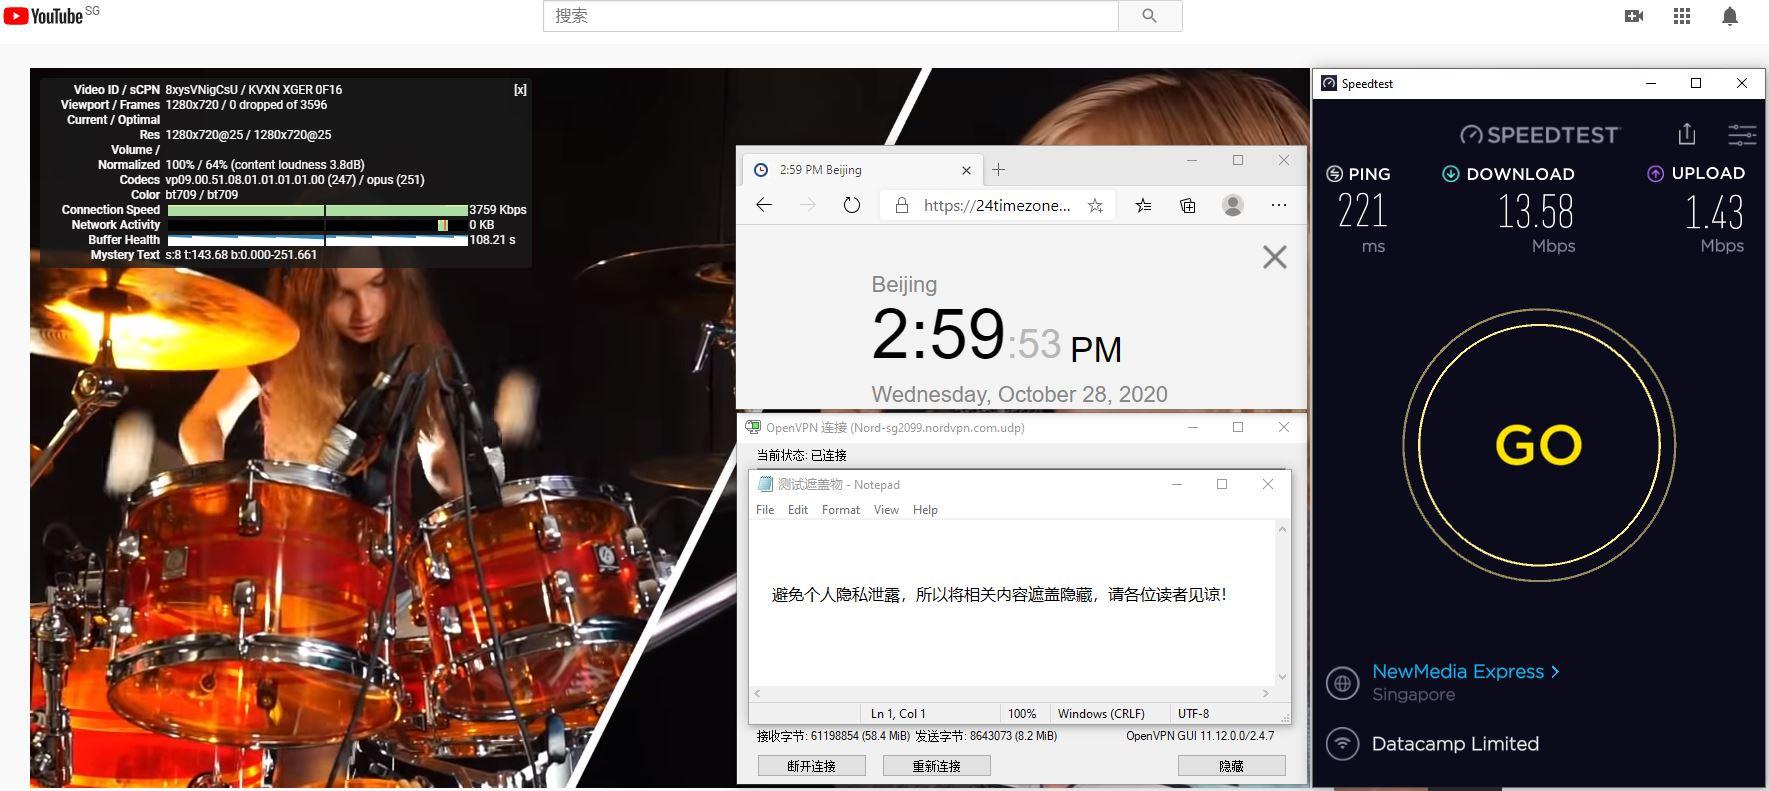 Windows10 NordVPN OpenVPN Gui sg2099 服务器 中国VPN 翻墙 科学上网 测试 - 20201028